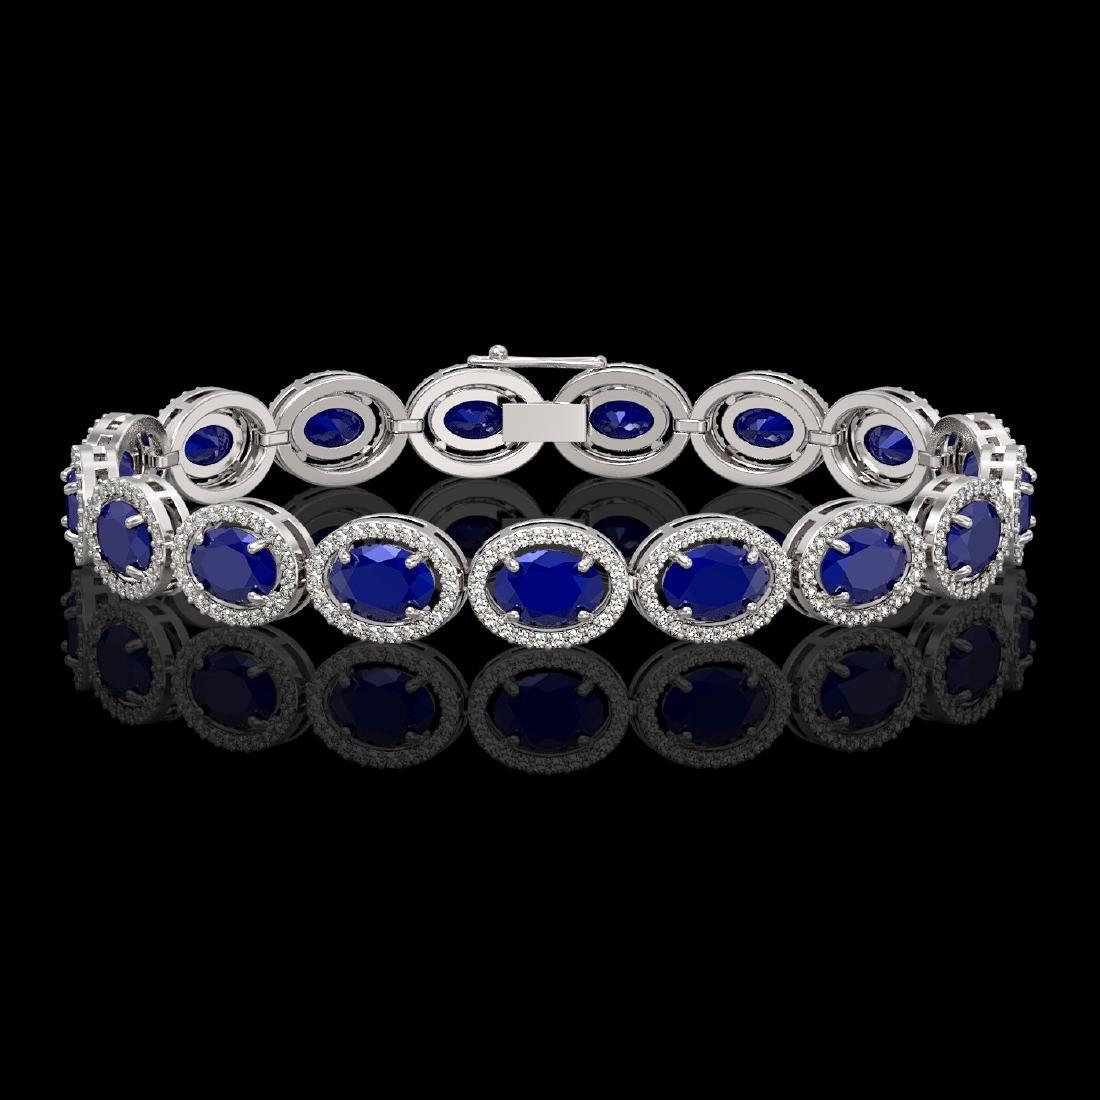 22.89 CTW Sapphire & Diamond Halo Bracelet 10K White